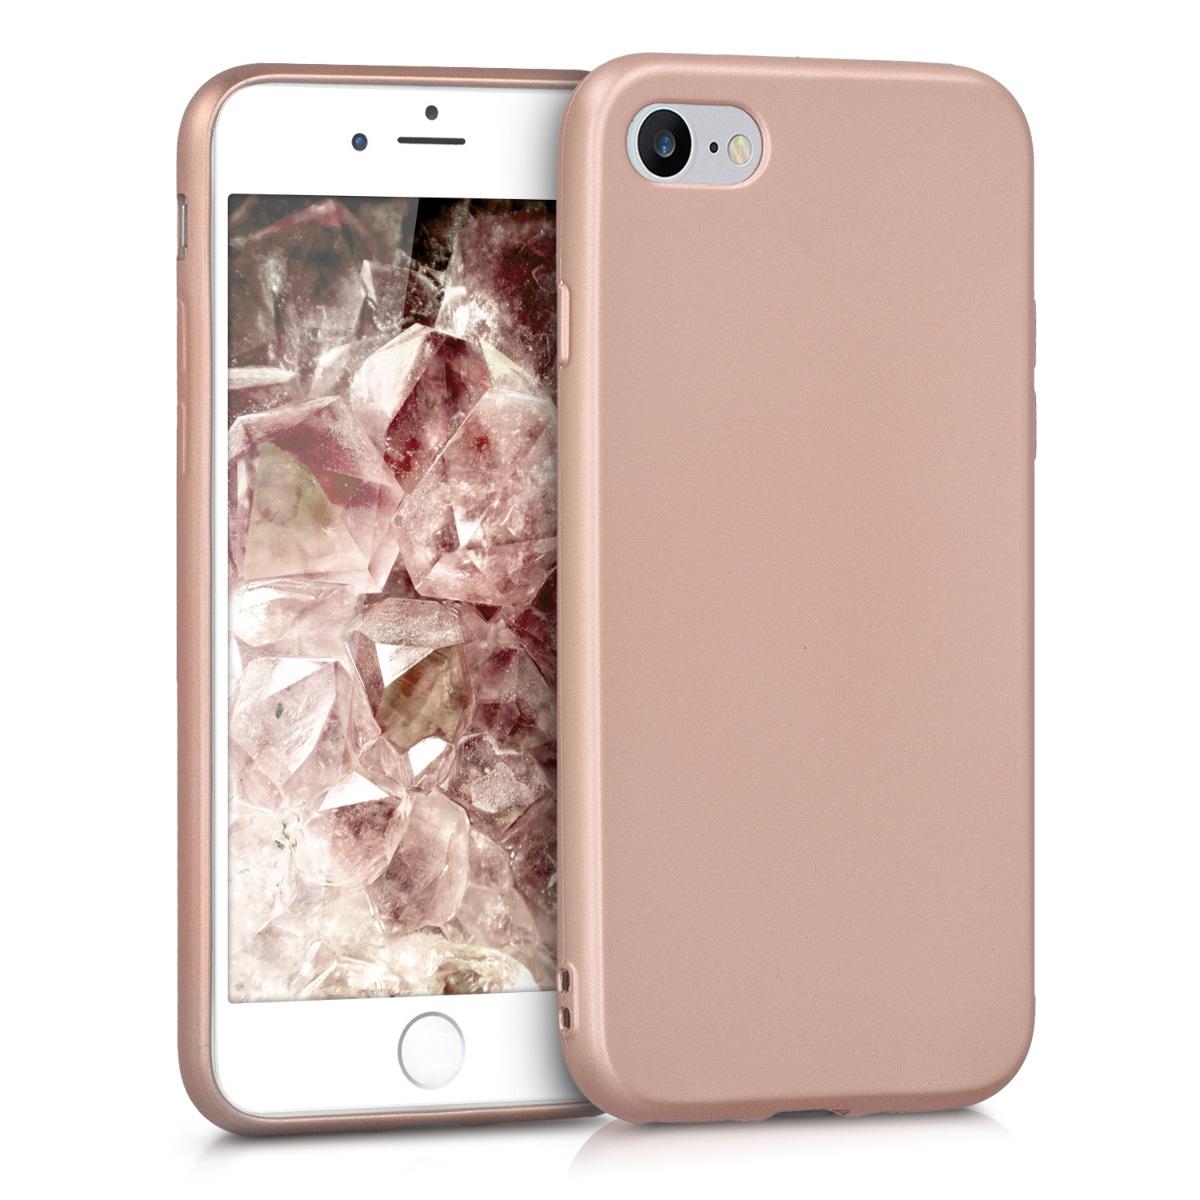 Kvalitní silikonové TPU pouzdro pro Apple iPhone 7 / 8 / SE  - Metallic Gold